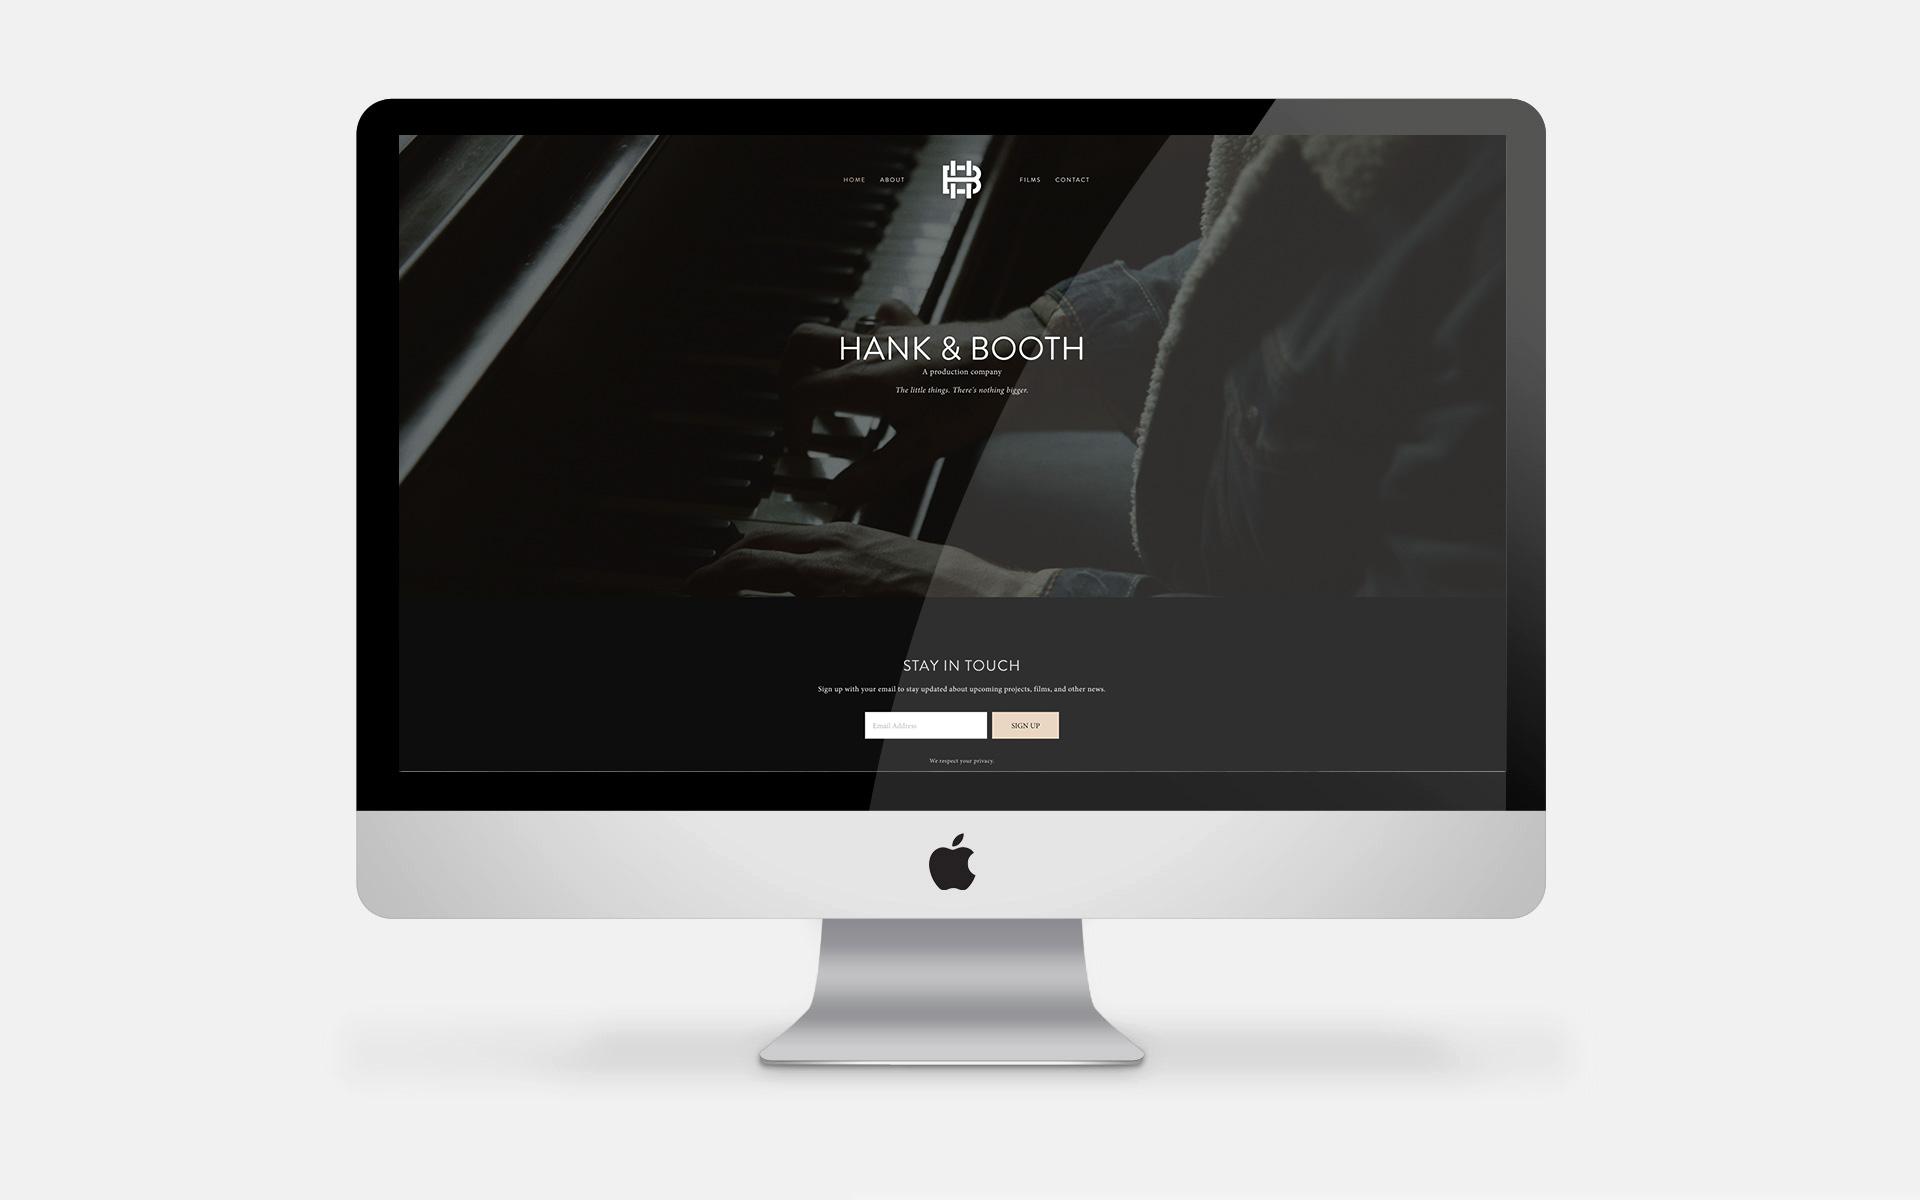 hank-and-booth-web.jpg